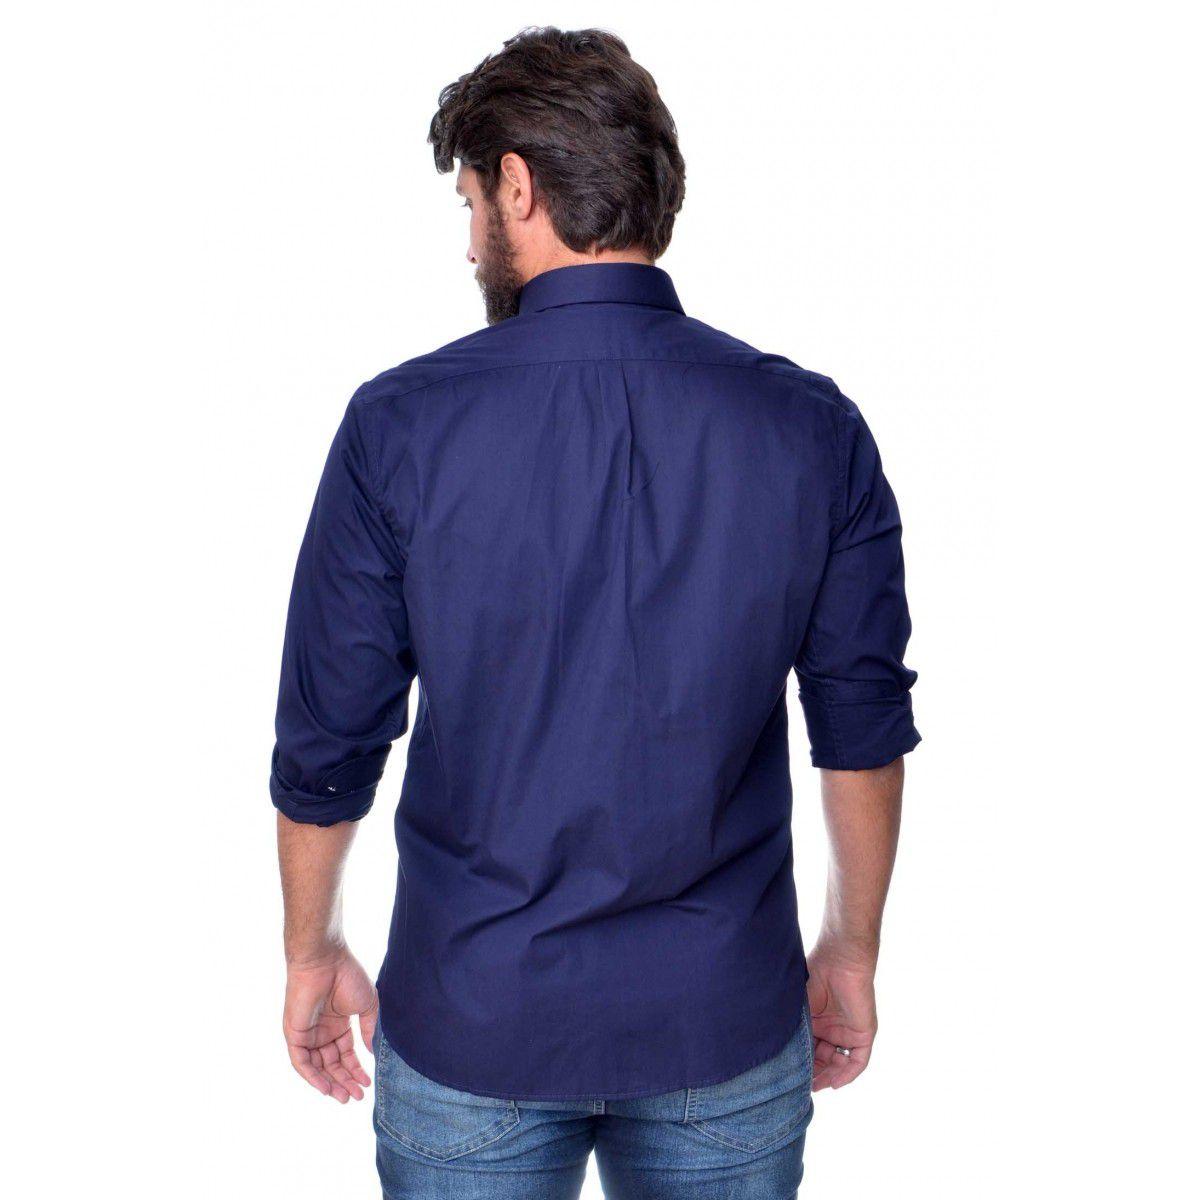 Camisa Social RL Marinho / Amar - Custom Fit  - Ca Brasileira